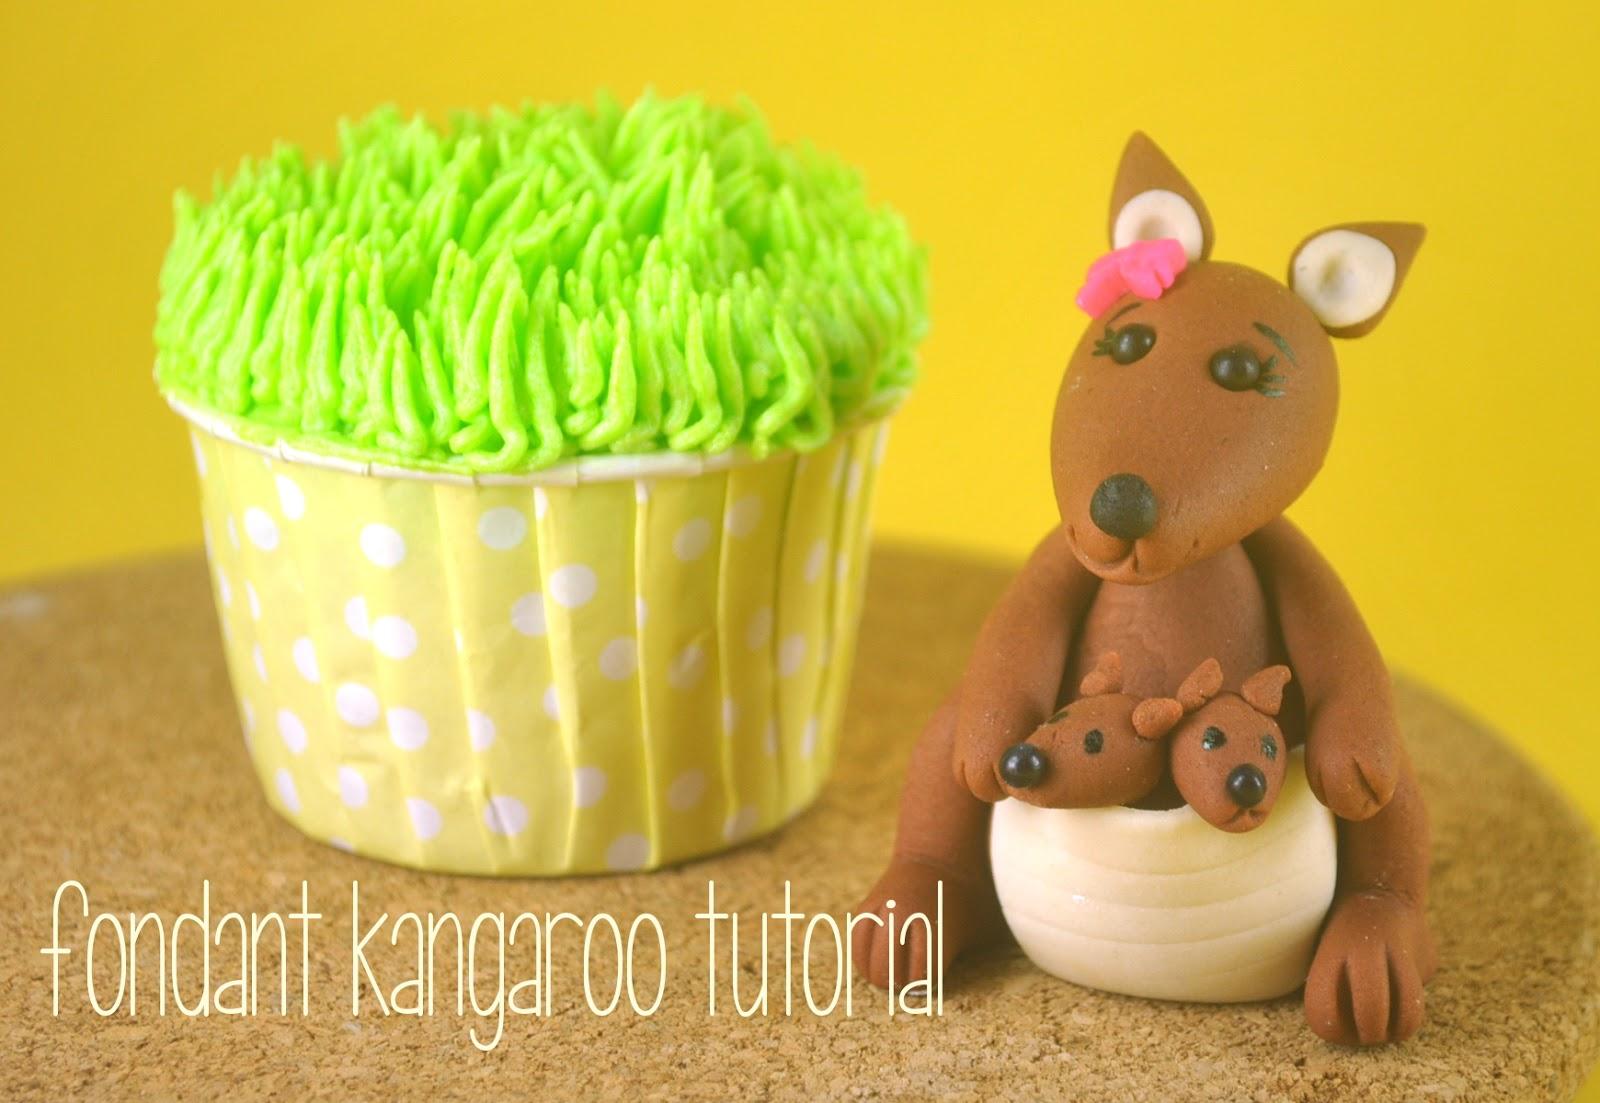 fondant kangaroo tutorial bake happy